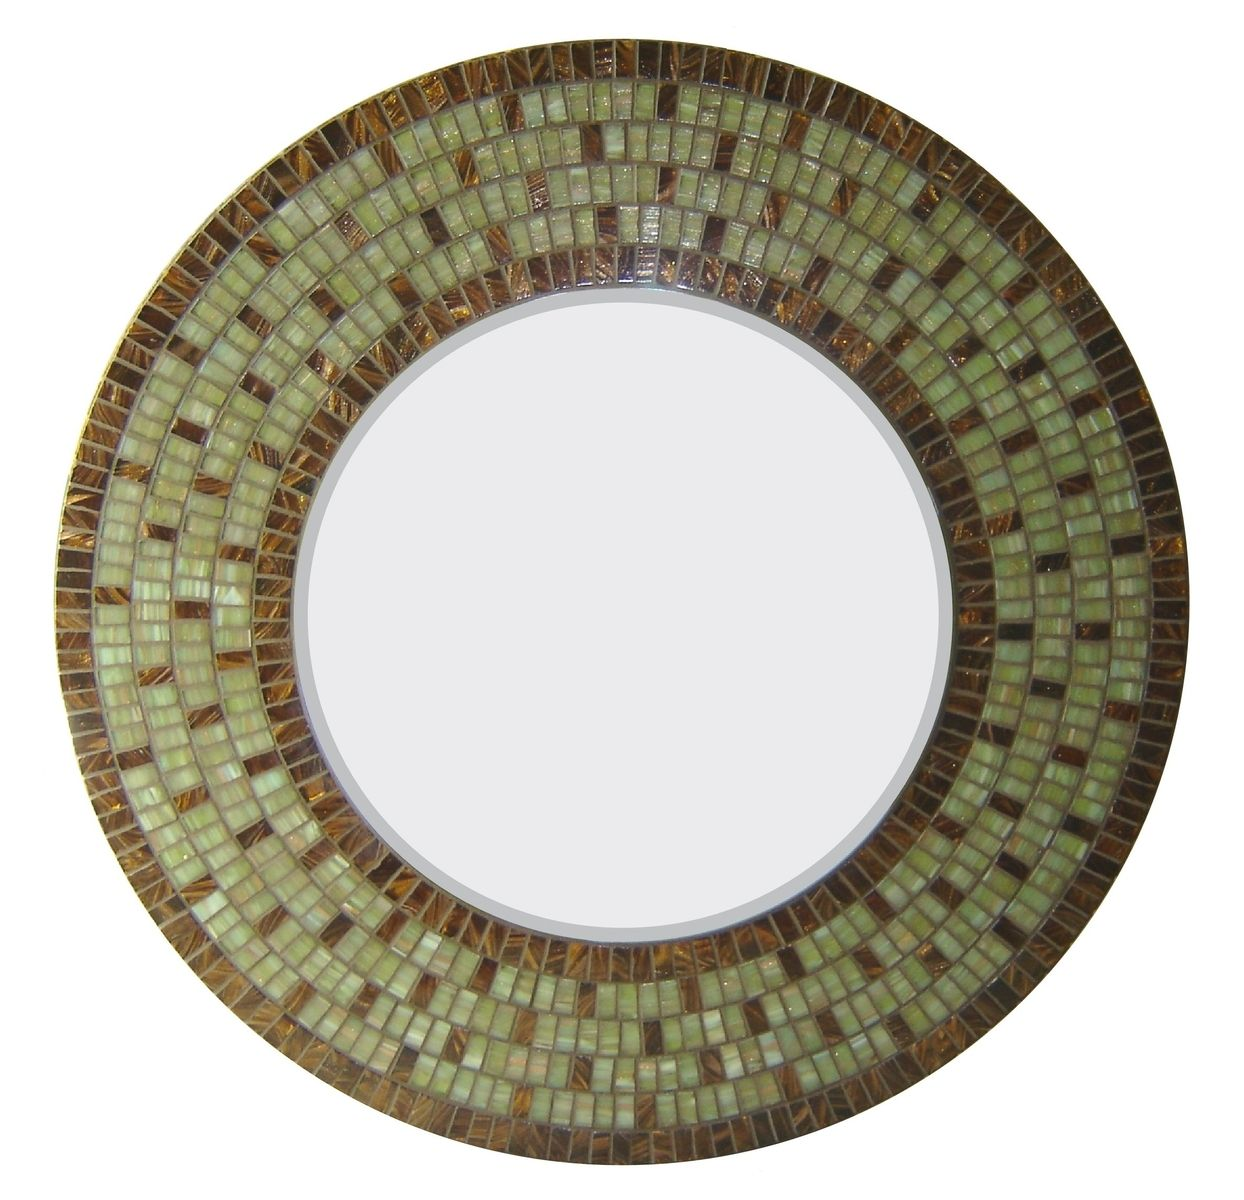 Custom Made Round Mosaic Glass Wall Mirror By Opus Mosaics